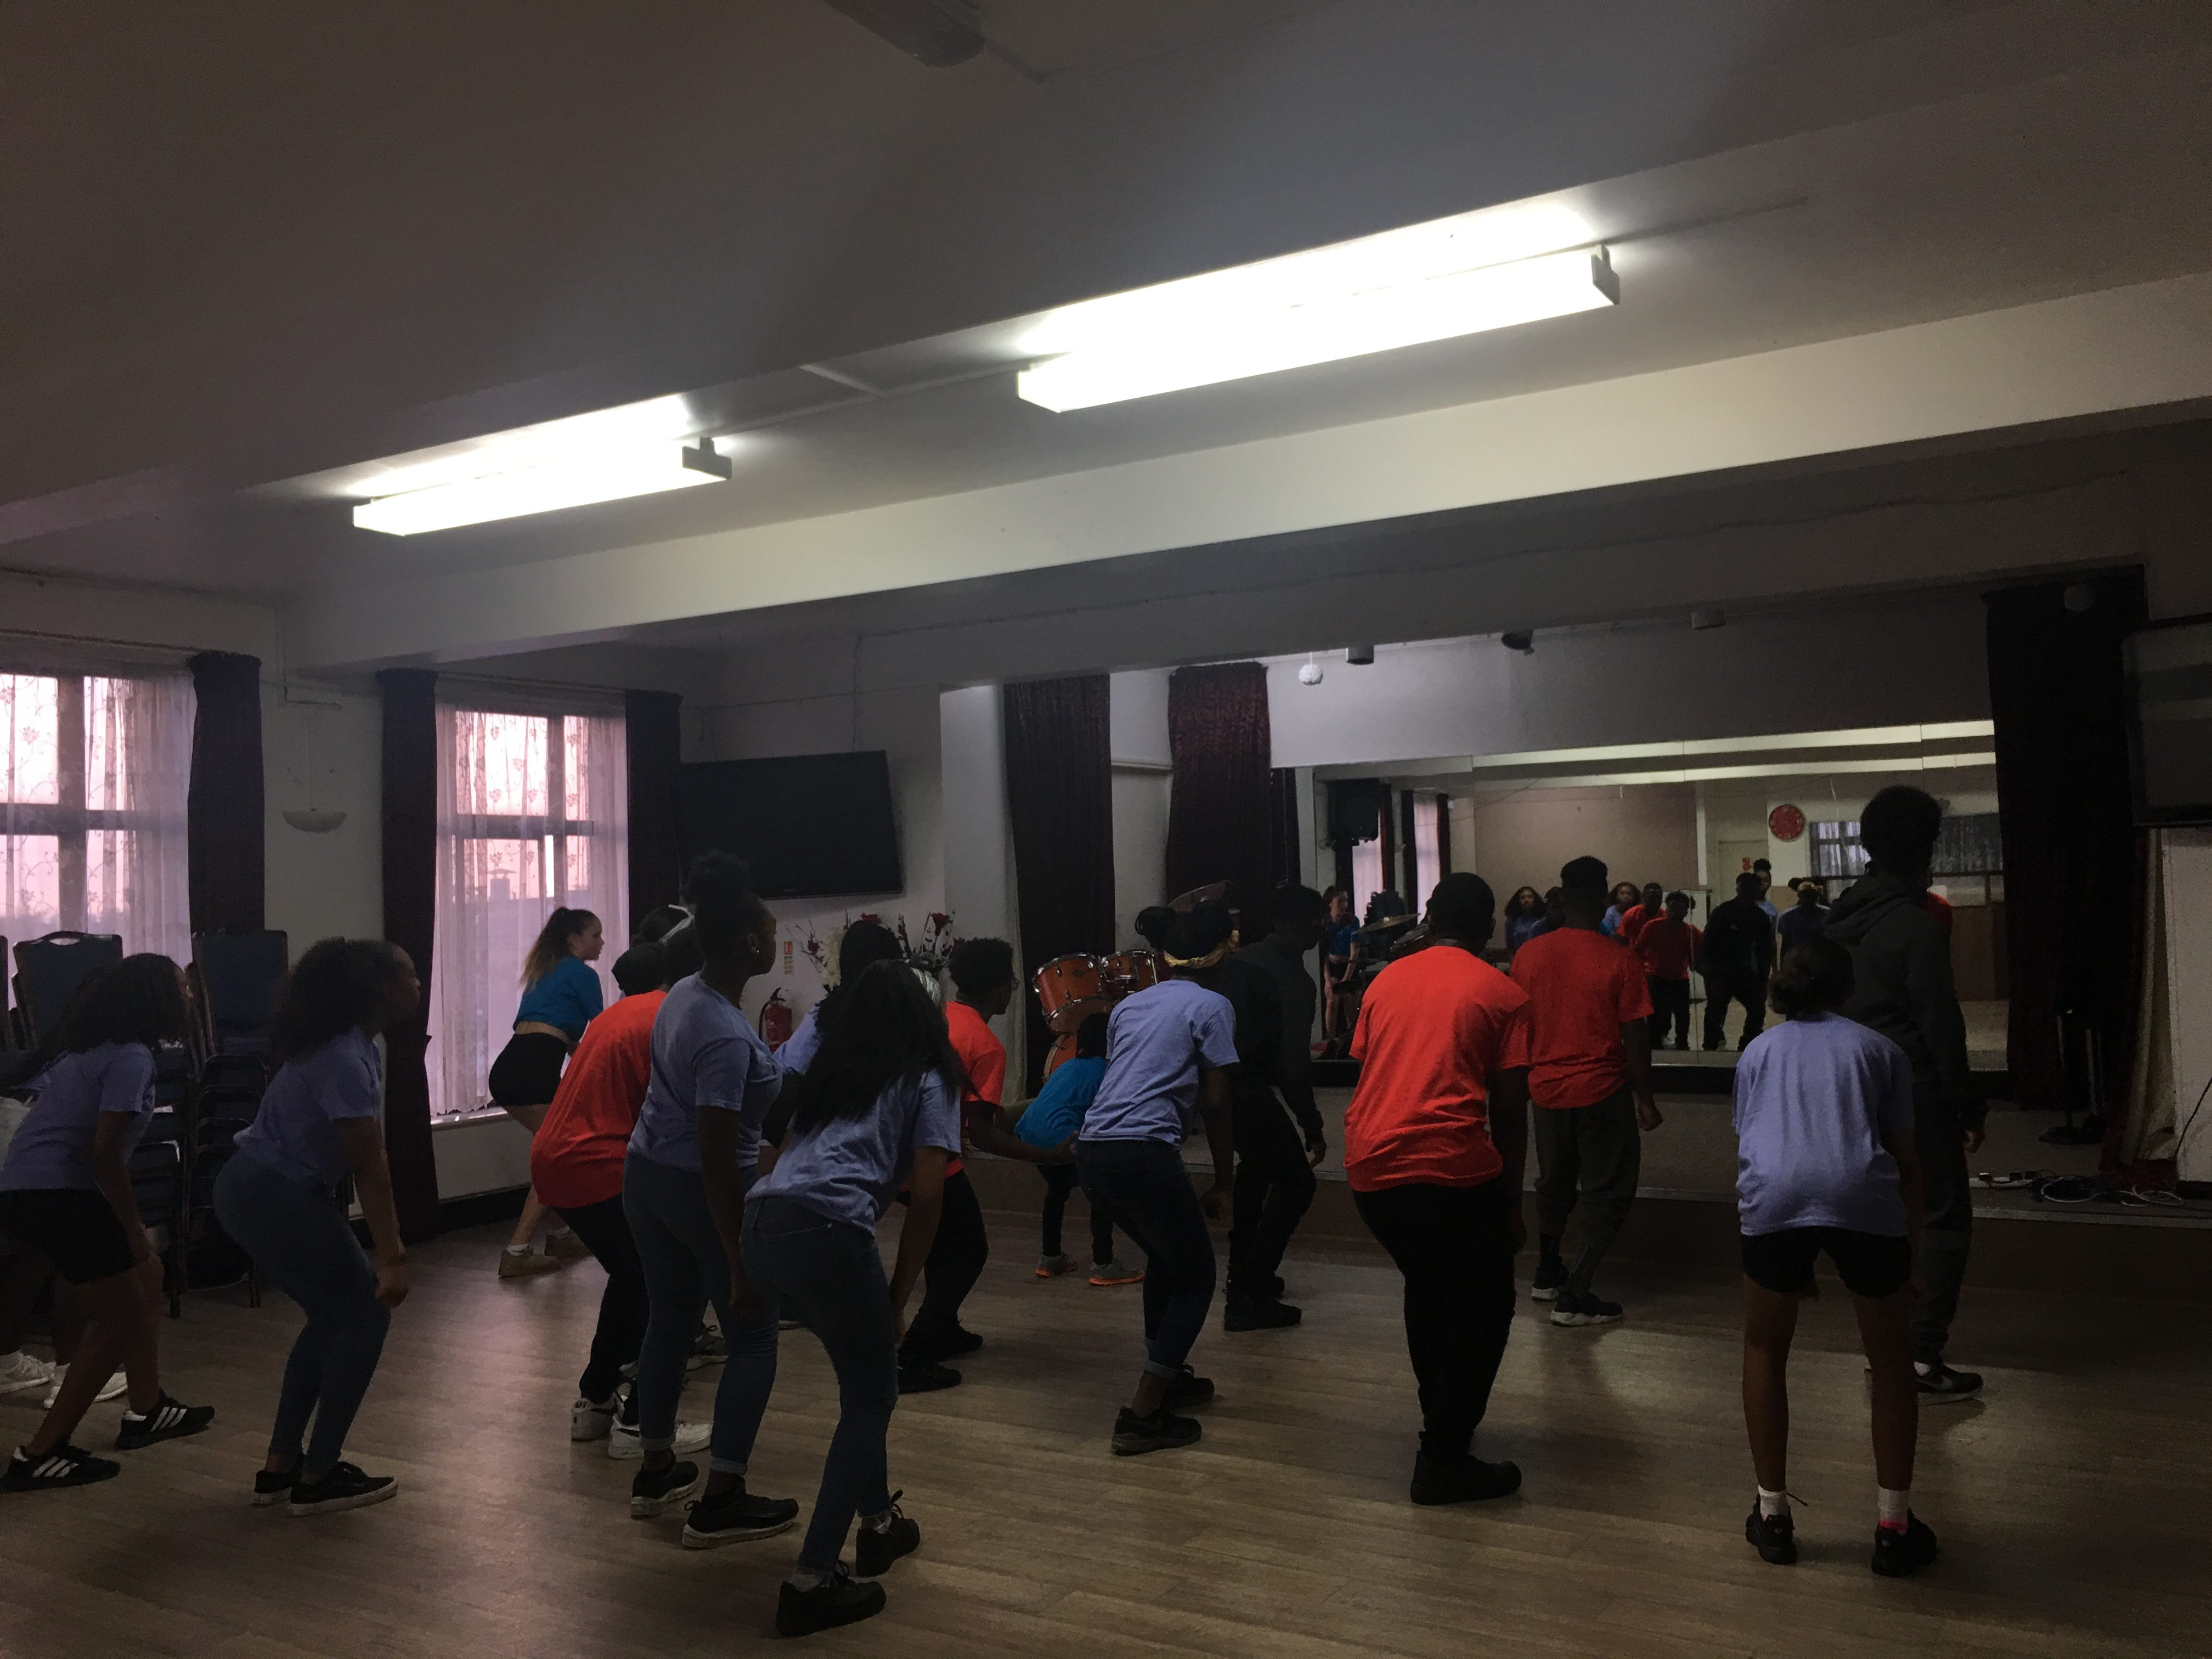 Attik Youth & Community Centre